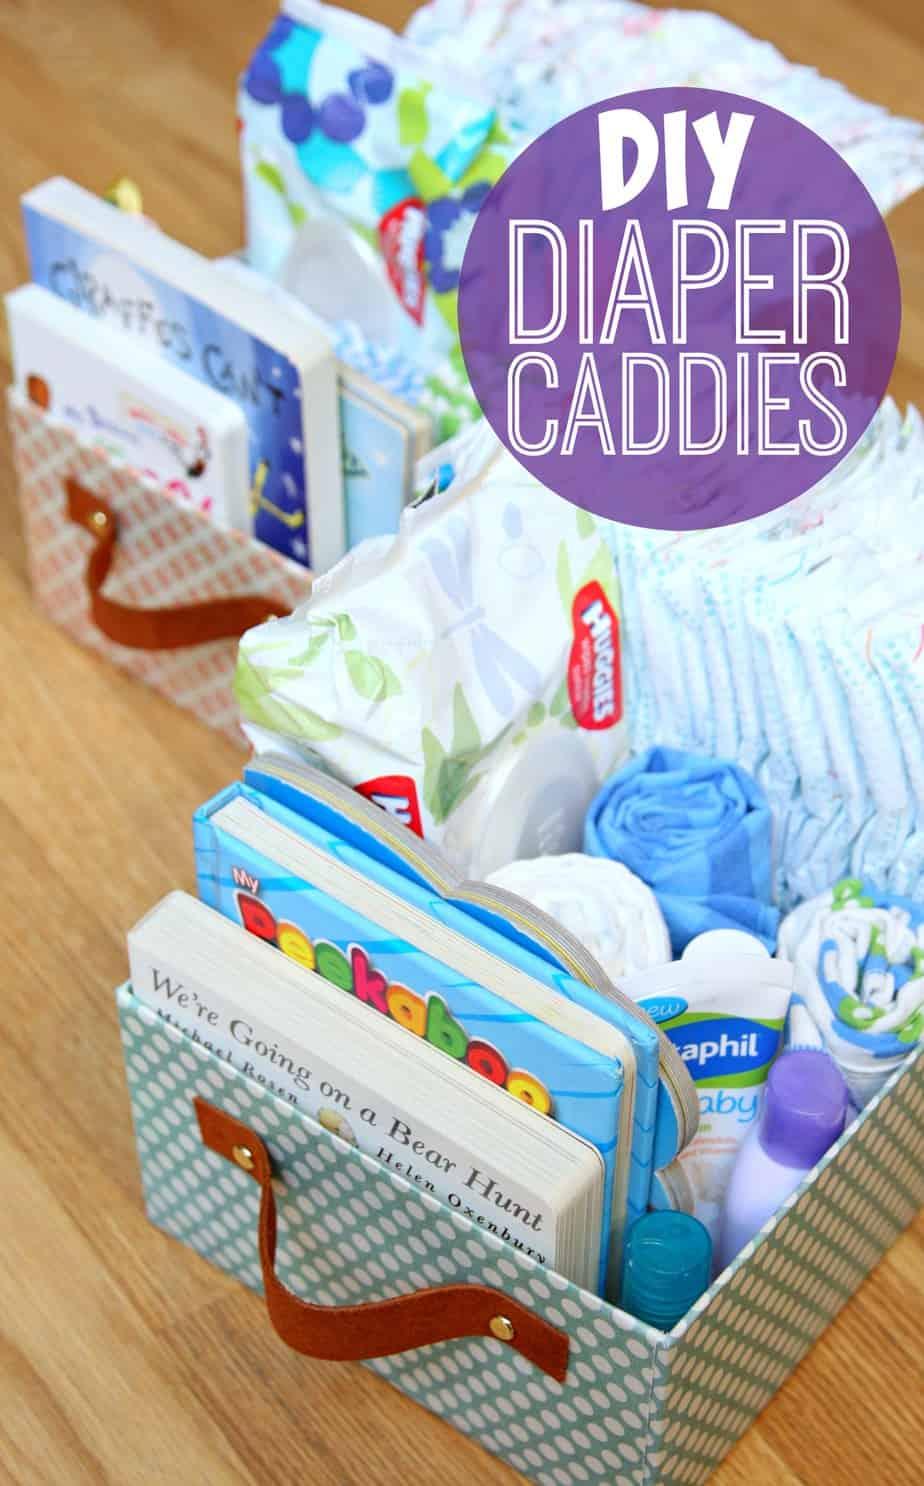 Diy Diaper Cads Kara Creates